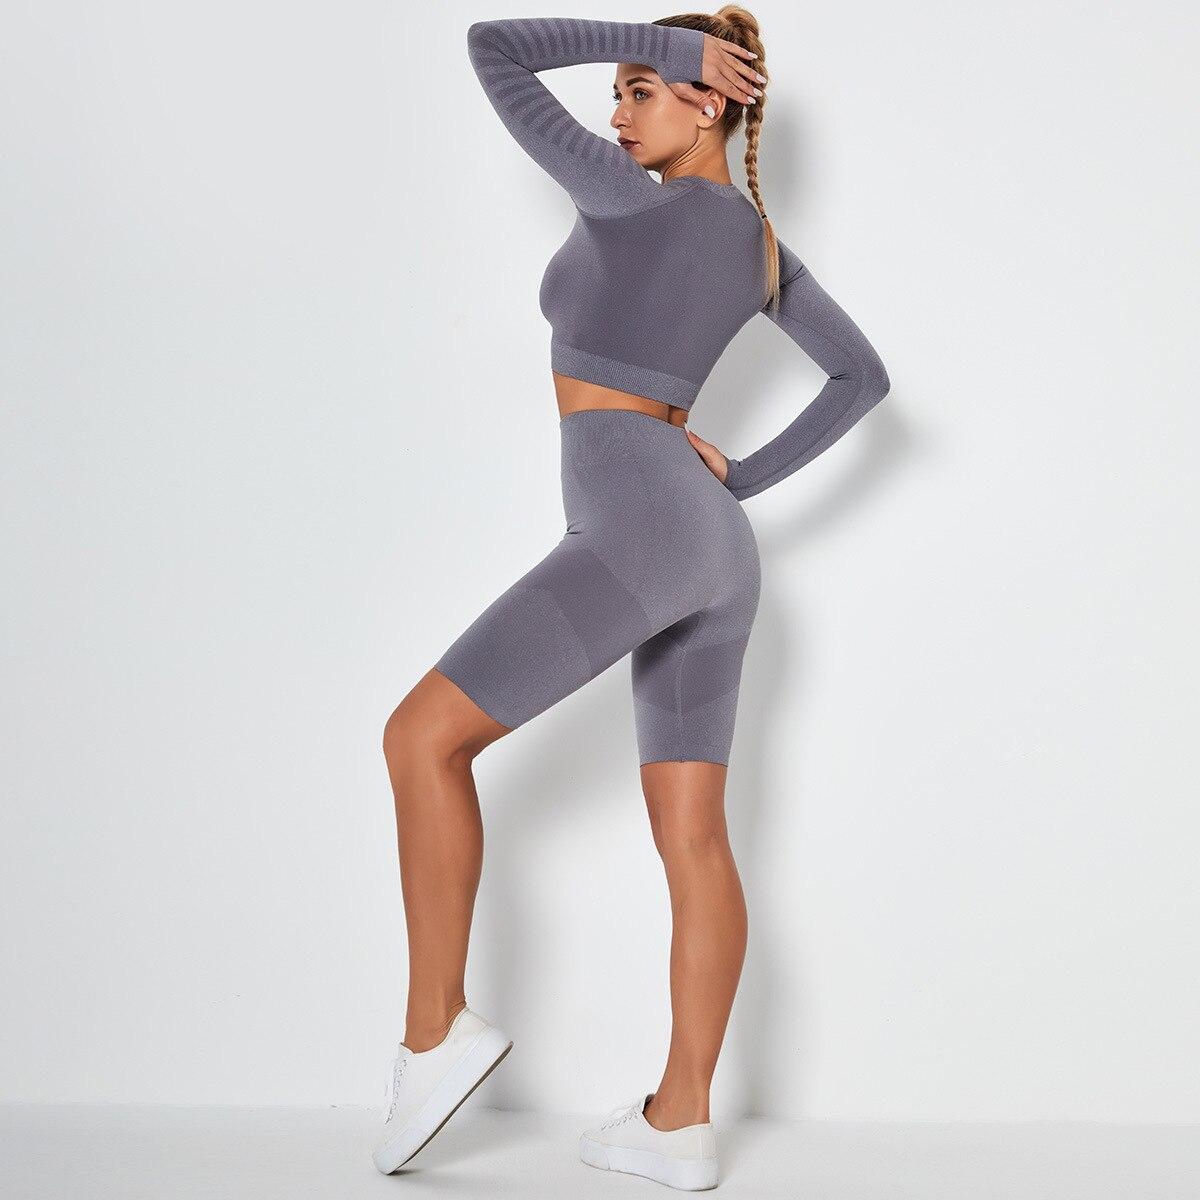 Leggings Clothing fitness Yoga kit pants biker shorts 2 piece set Bodysuit suits for yoga gym Tracksuit women shorts female run